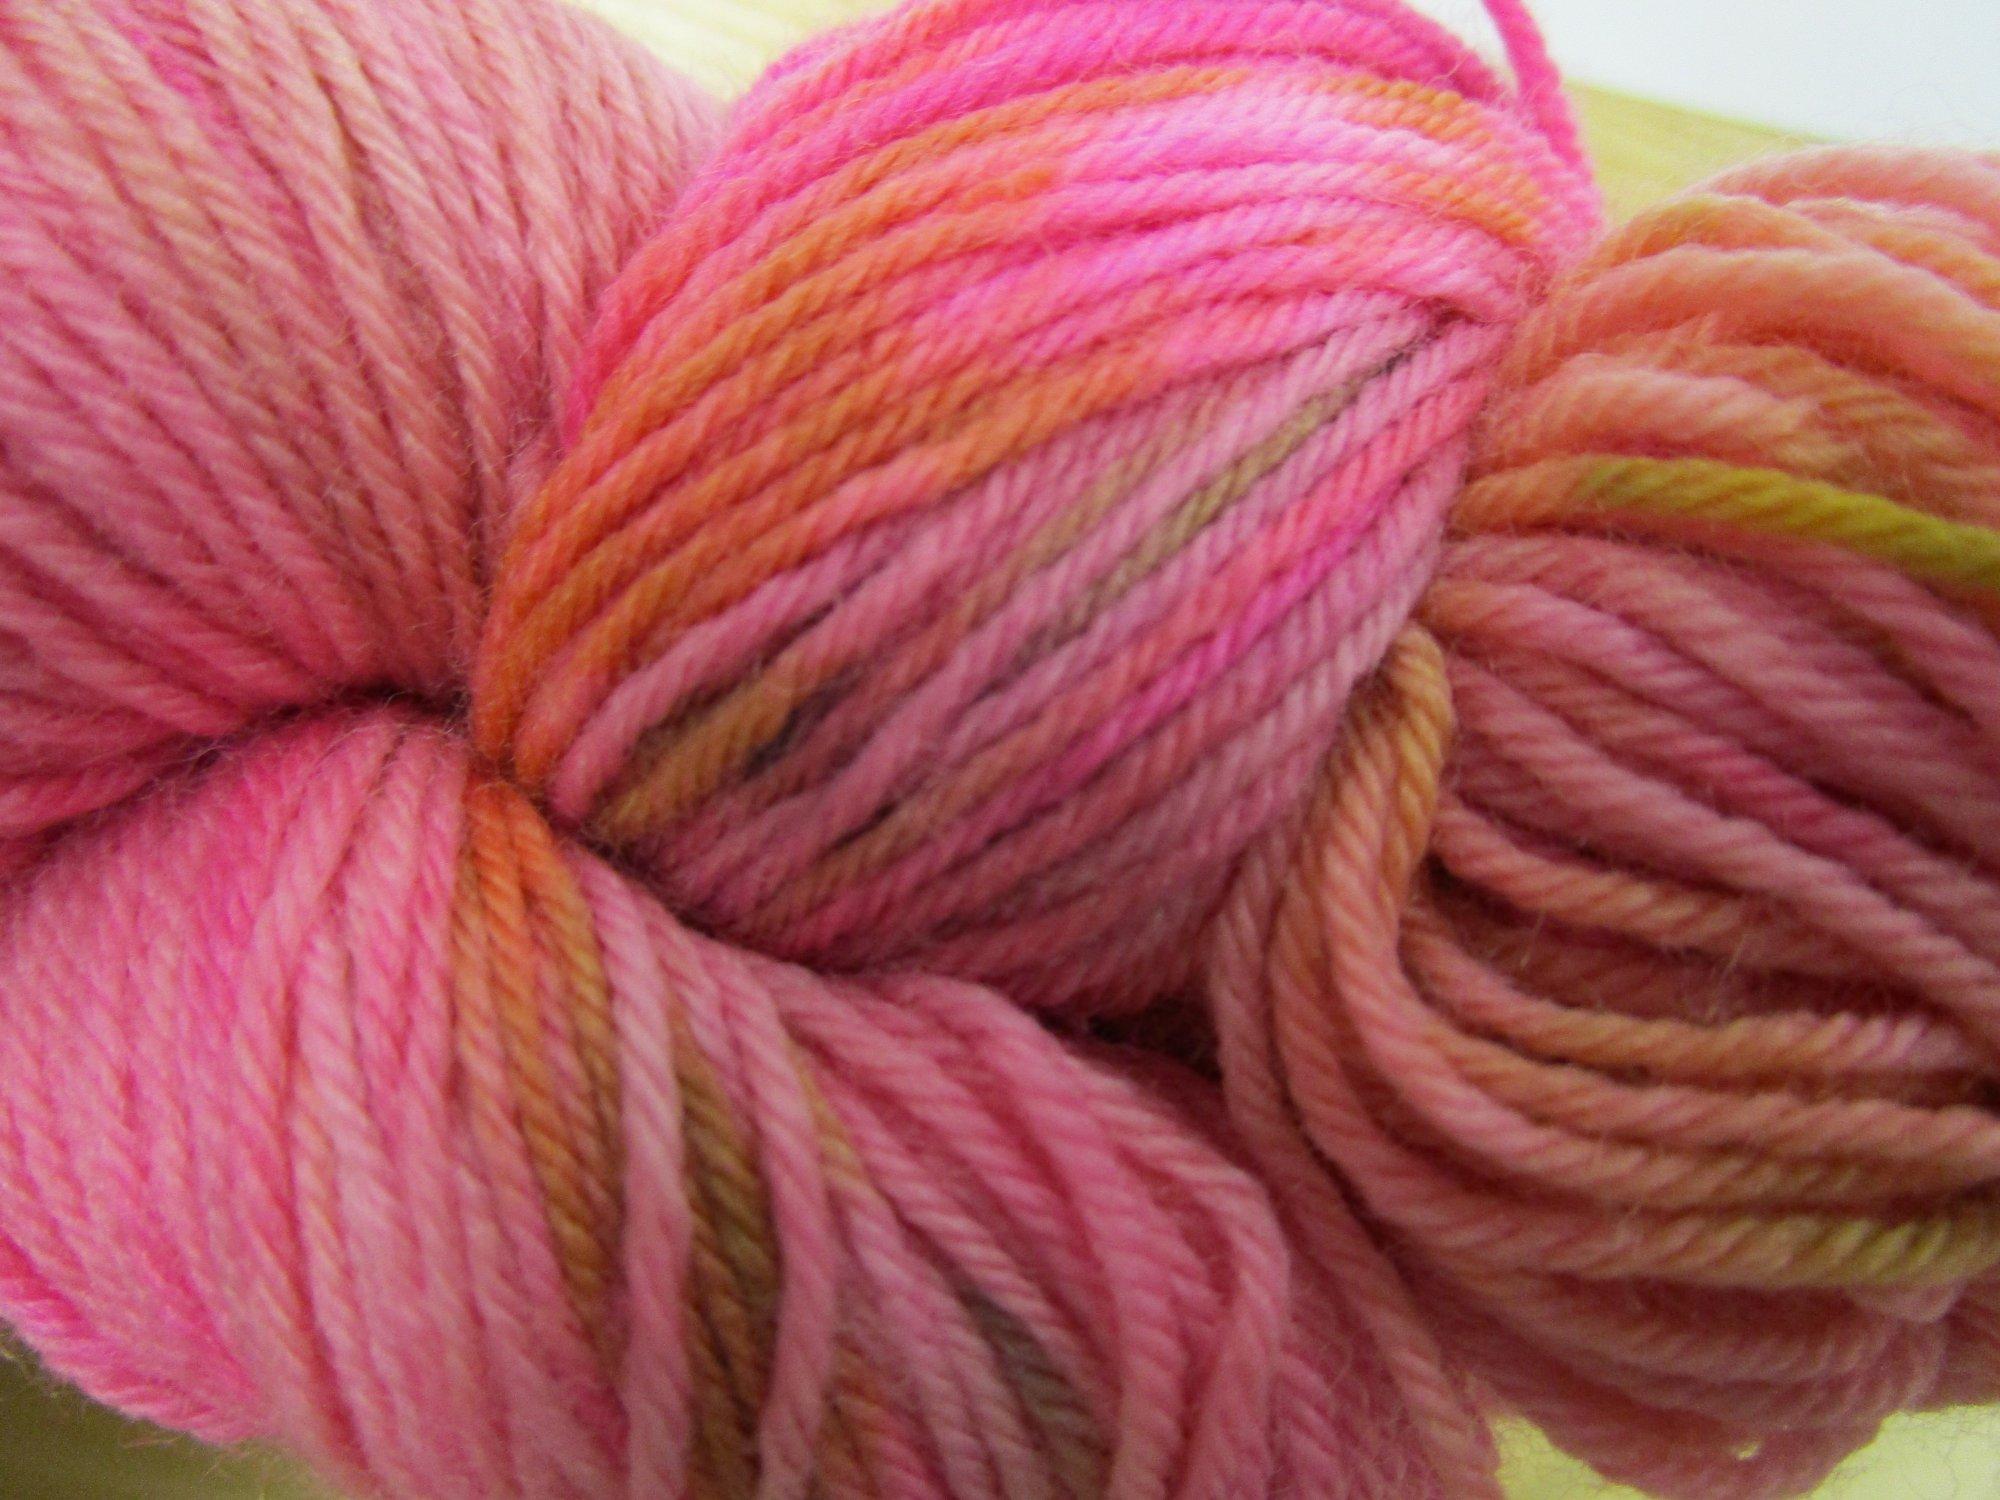 smooth sock not my knitting you bi!@h!